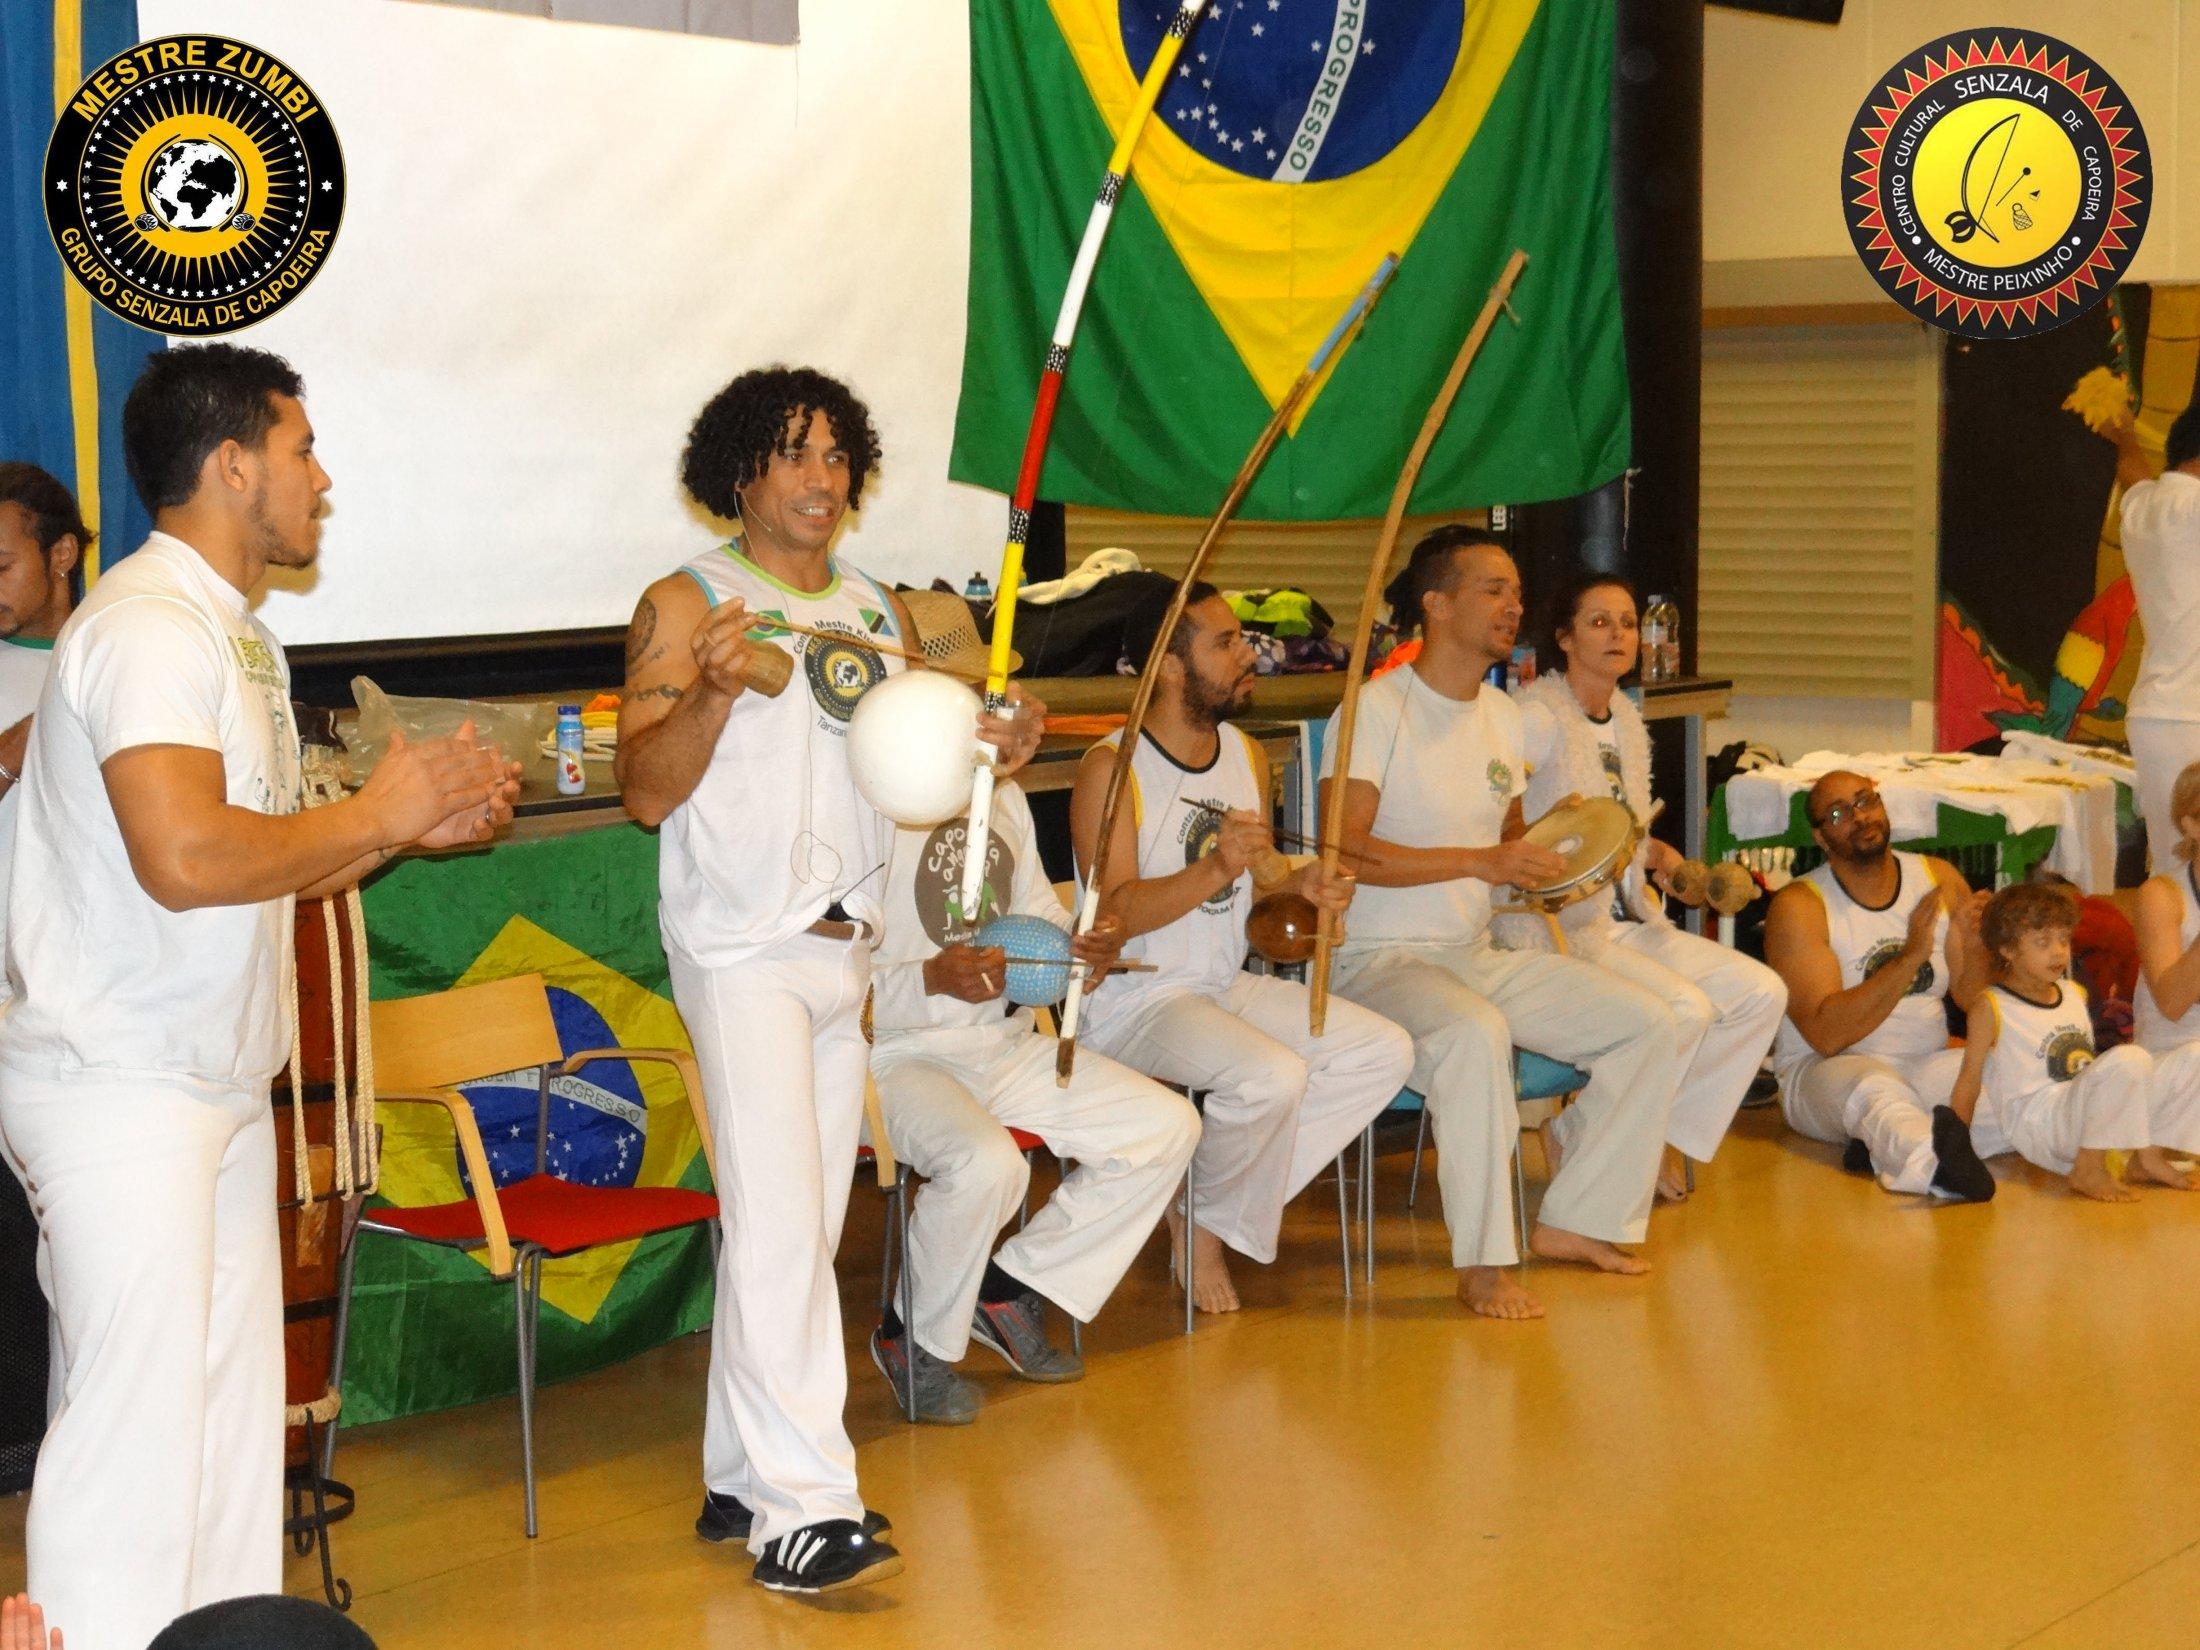 2013-12-14 - Capoeira 046